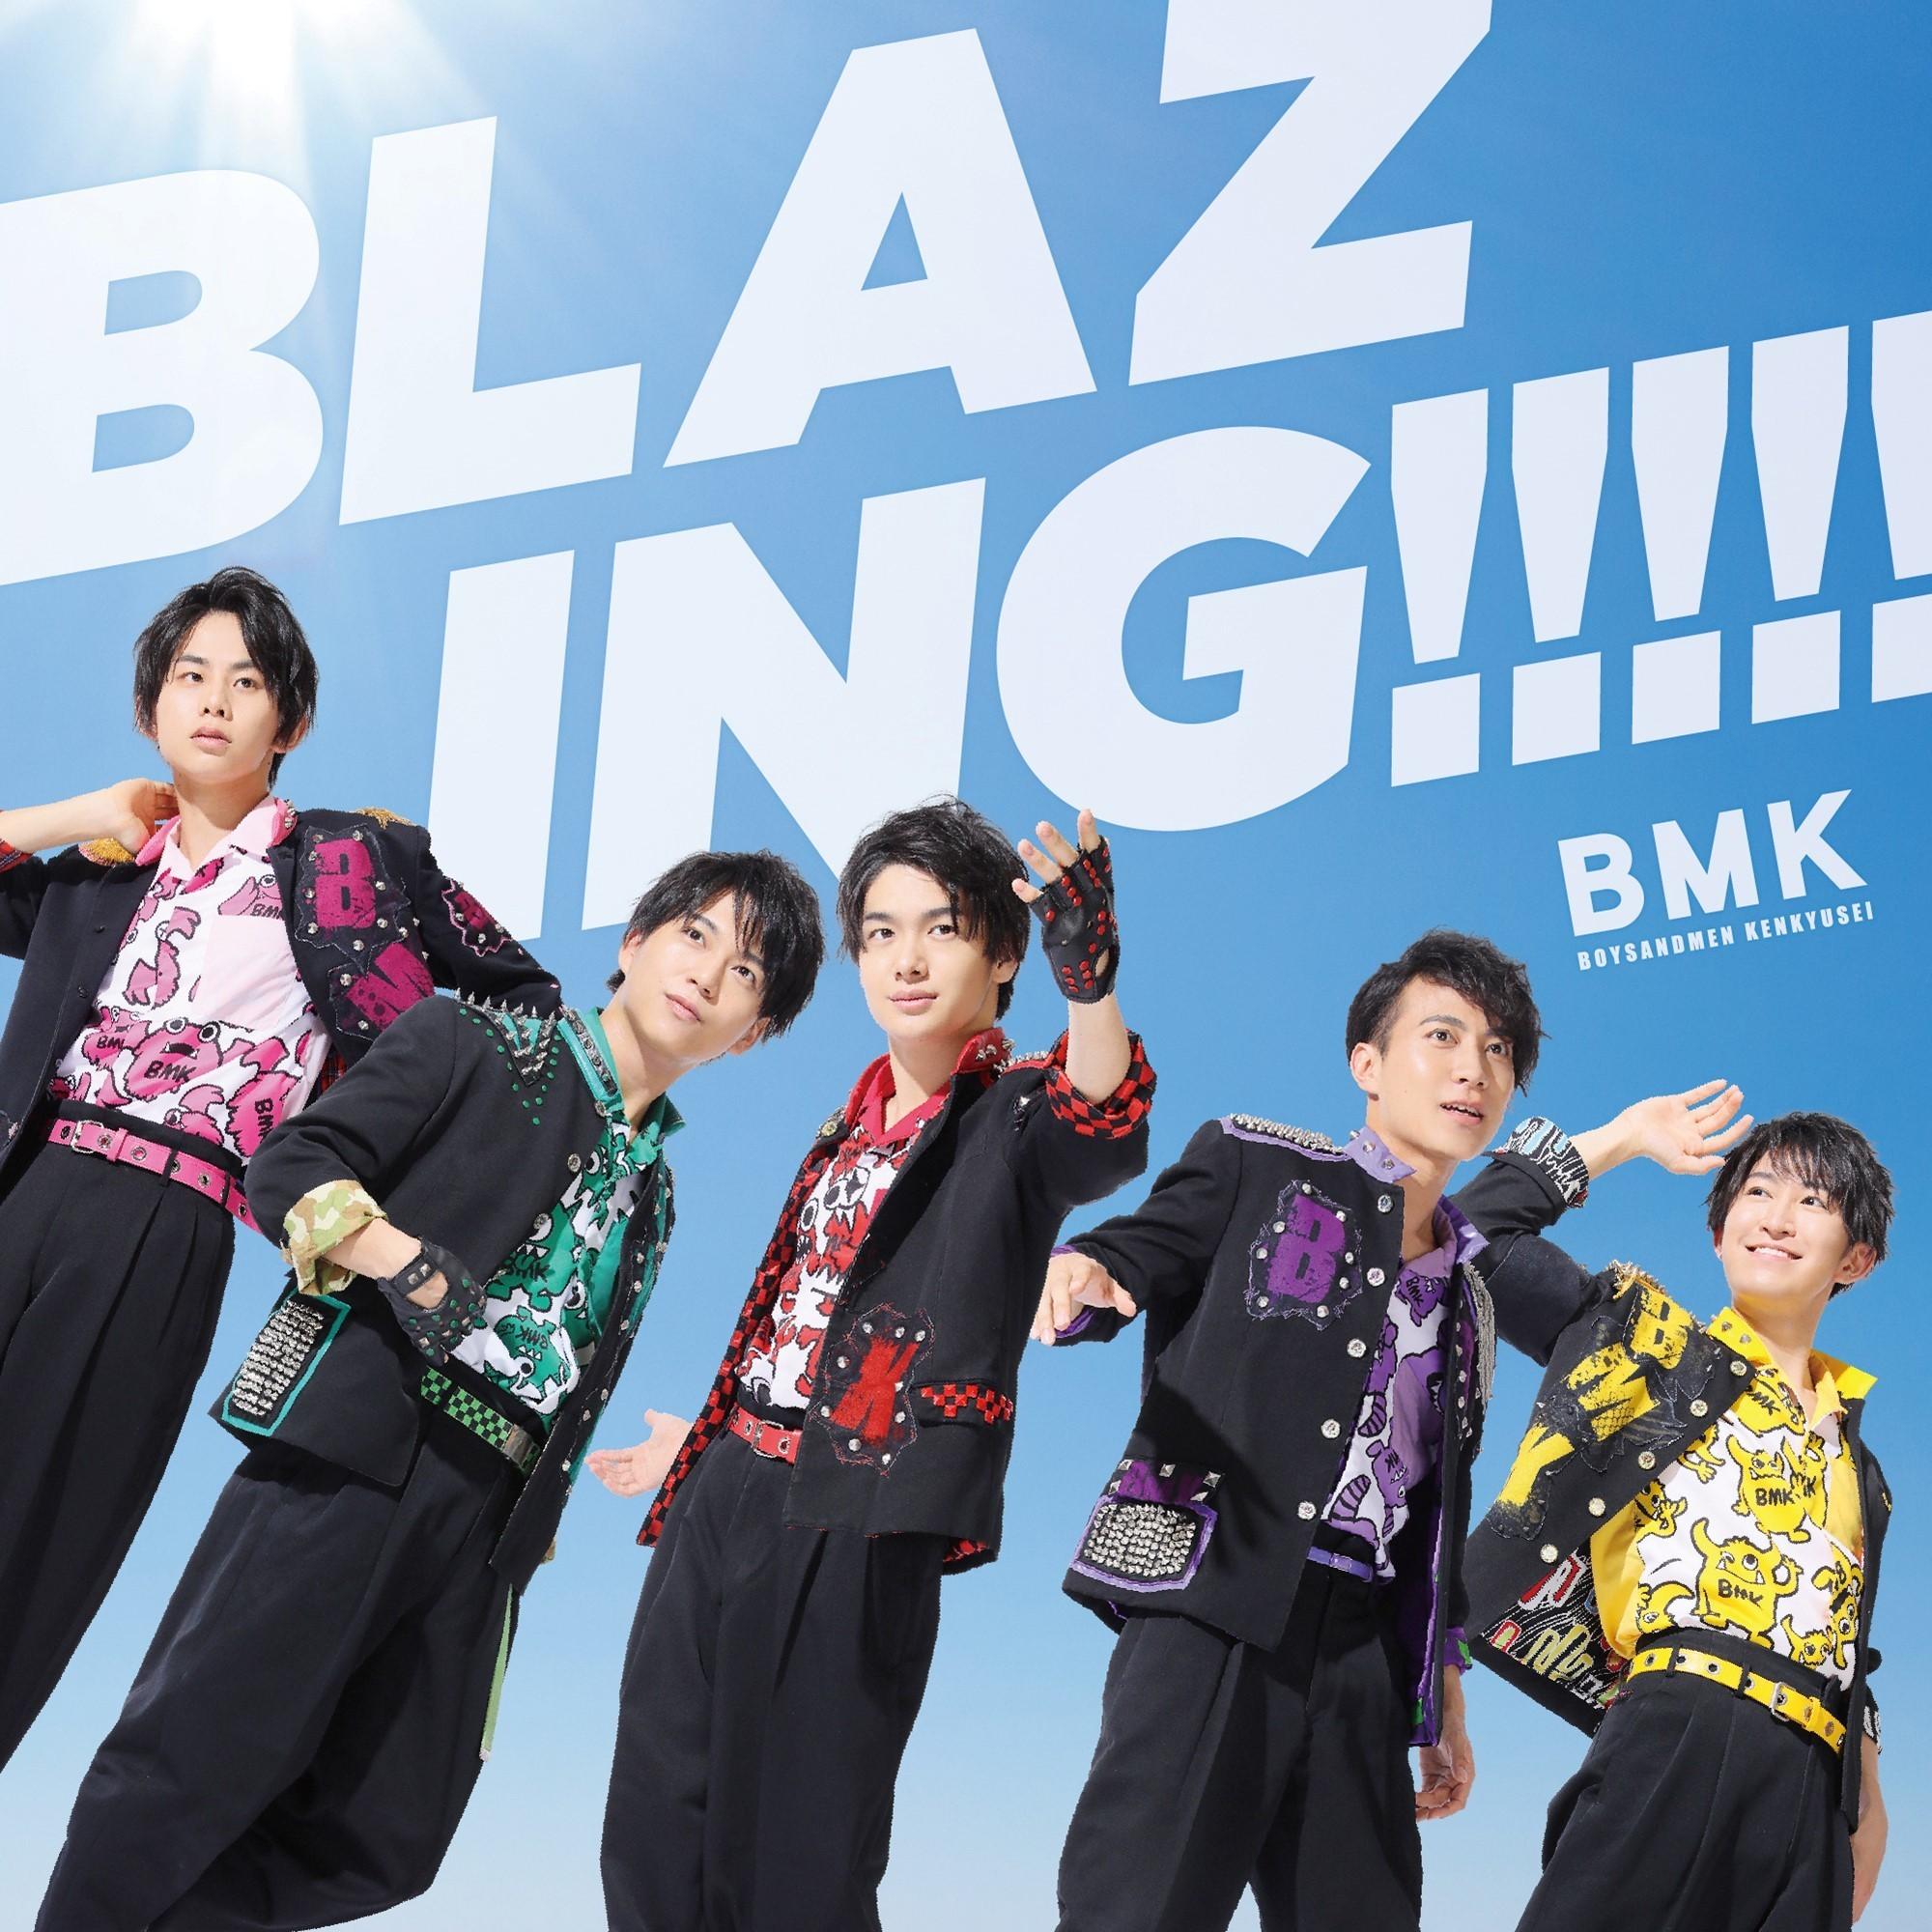 Blazing_jk